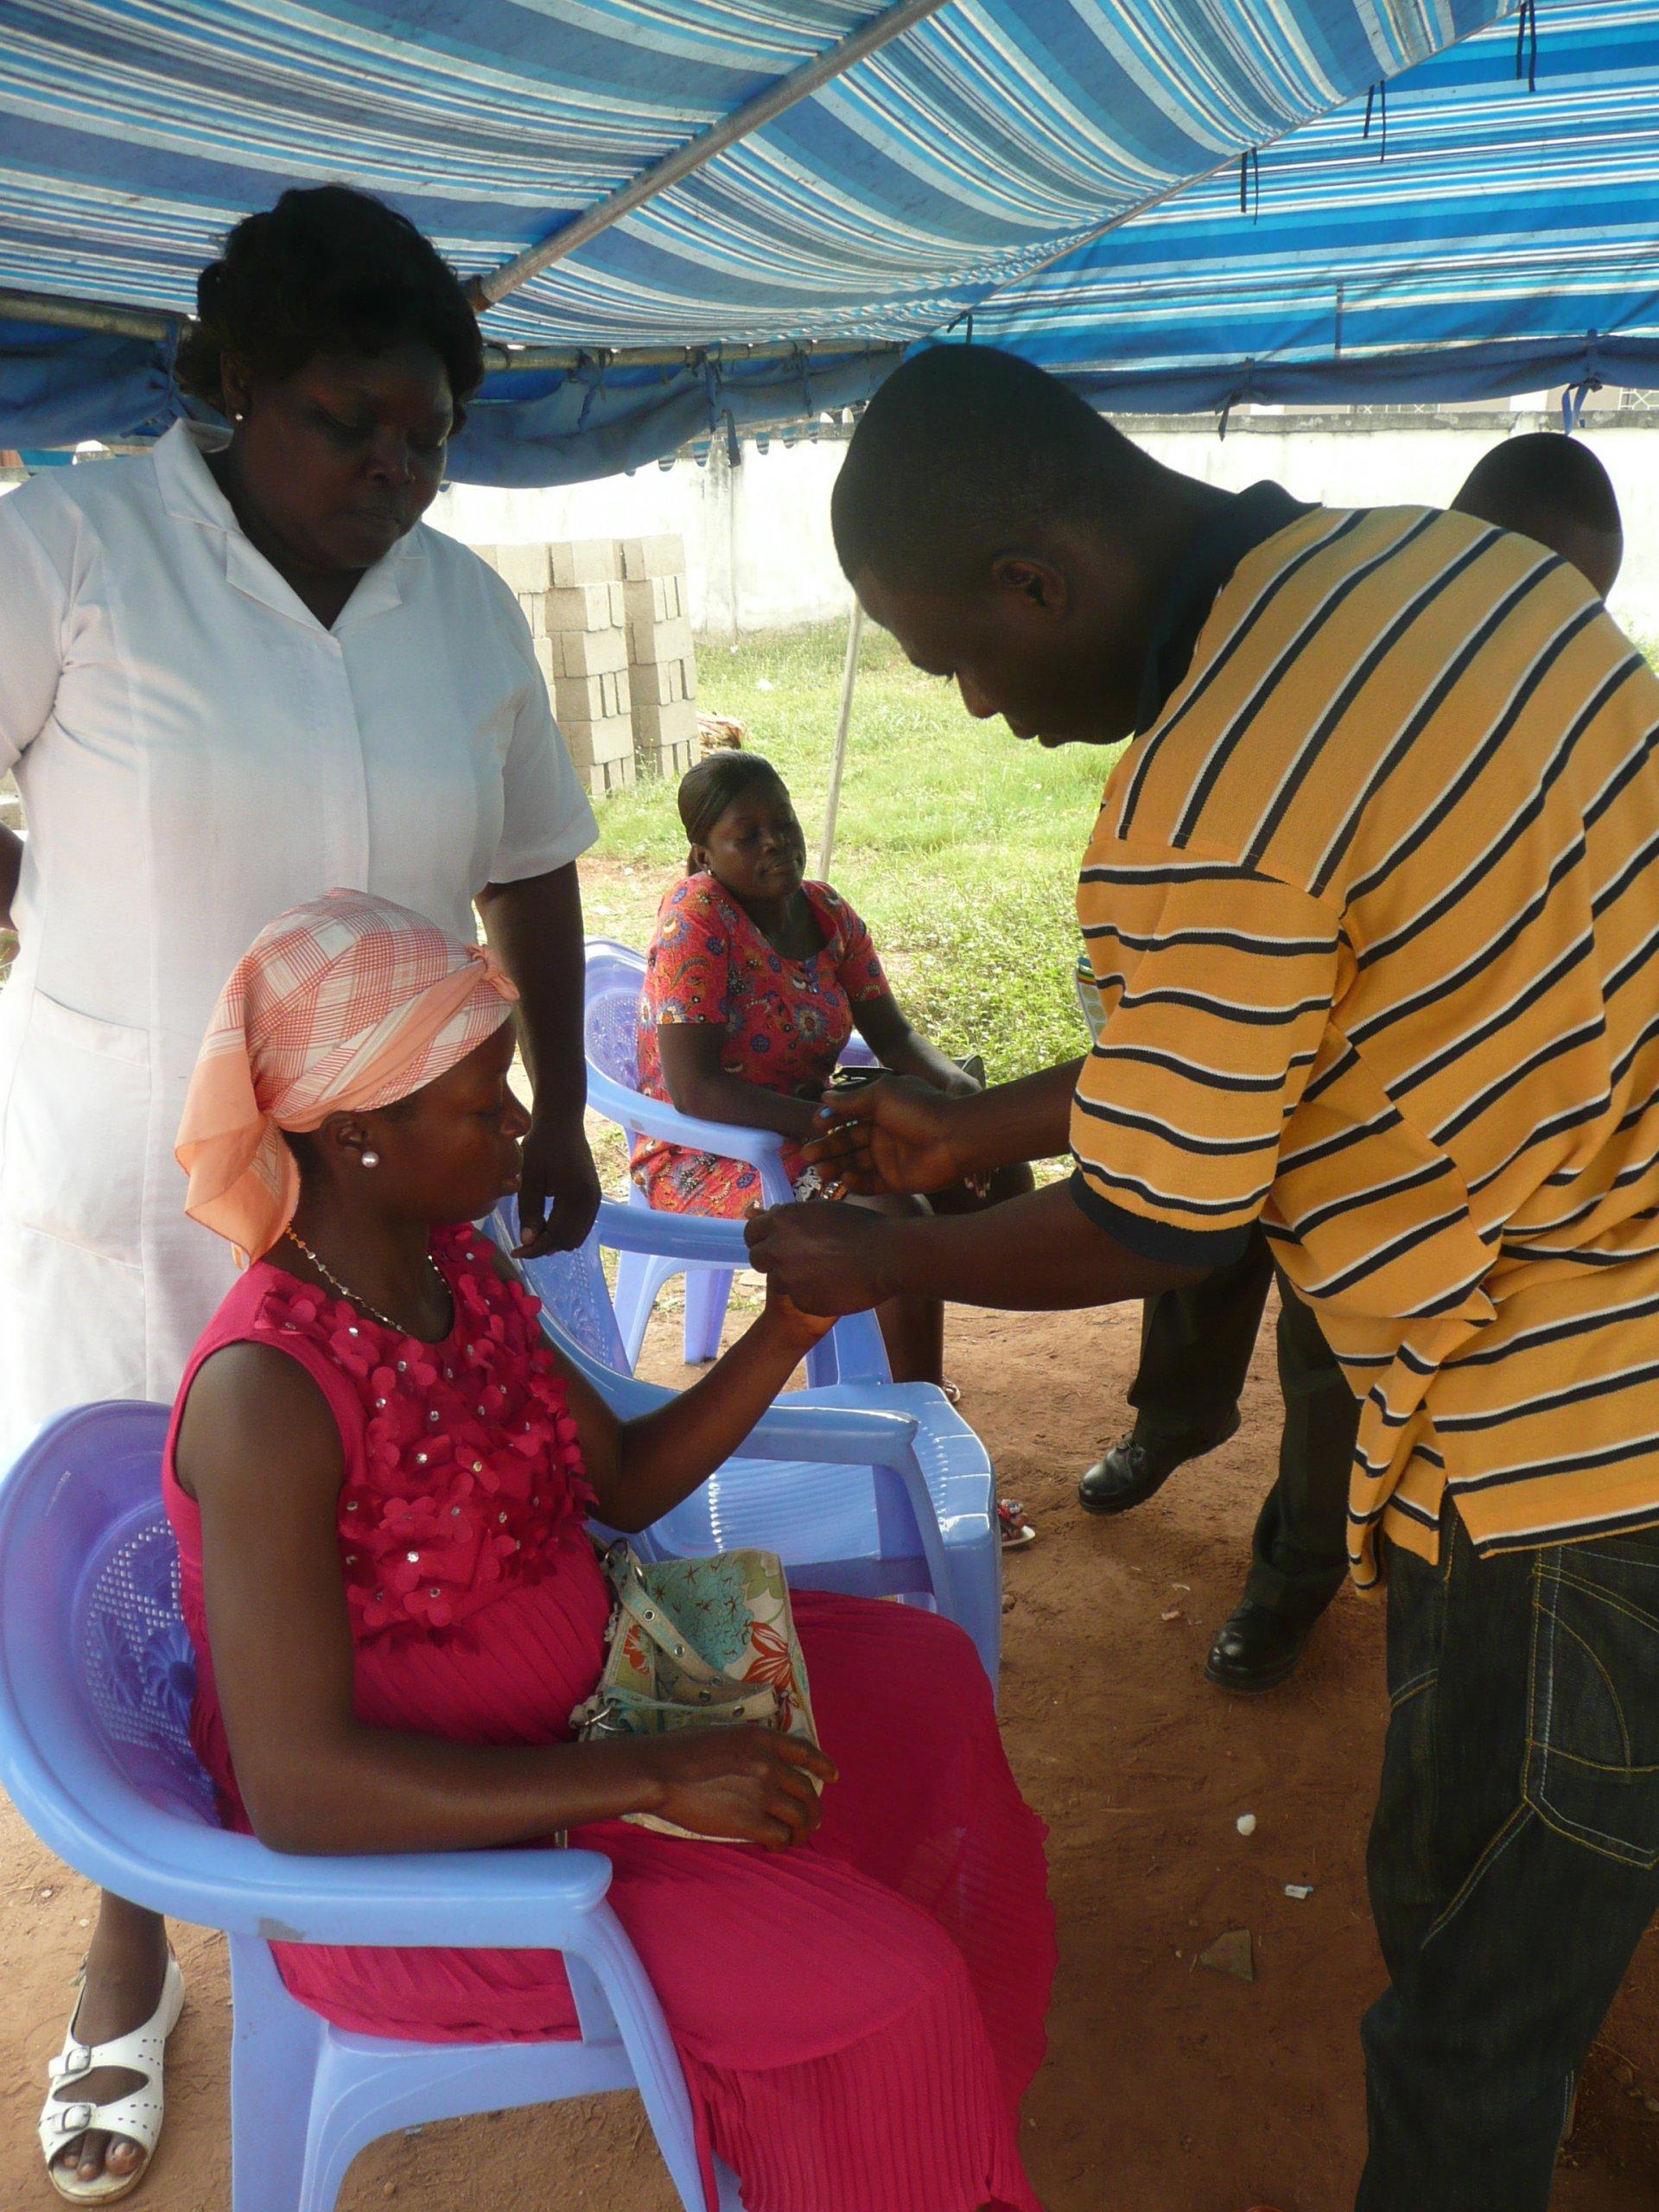 Pregnant woman getting an RDT